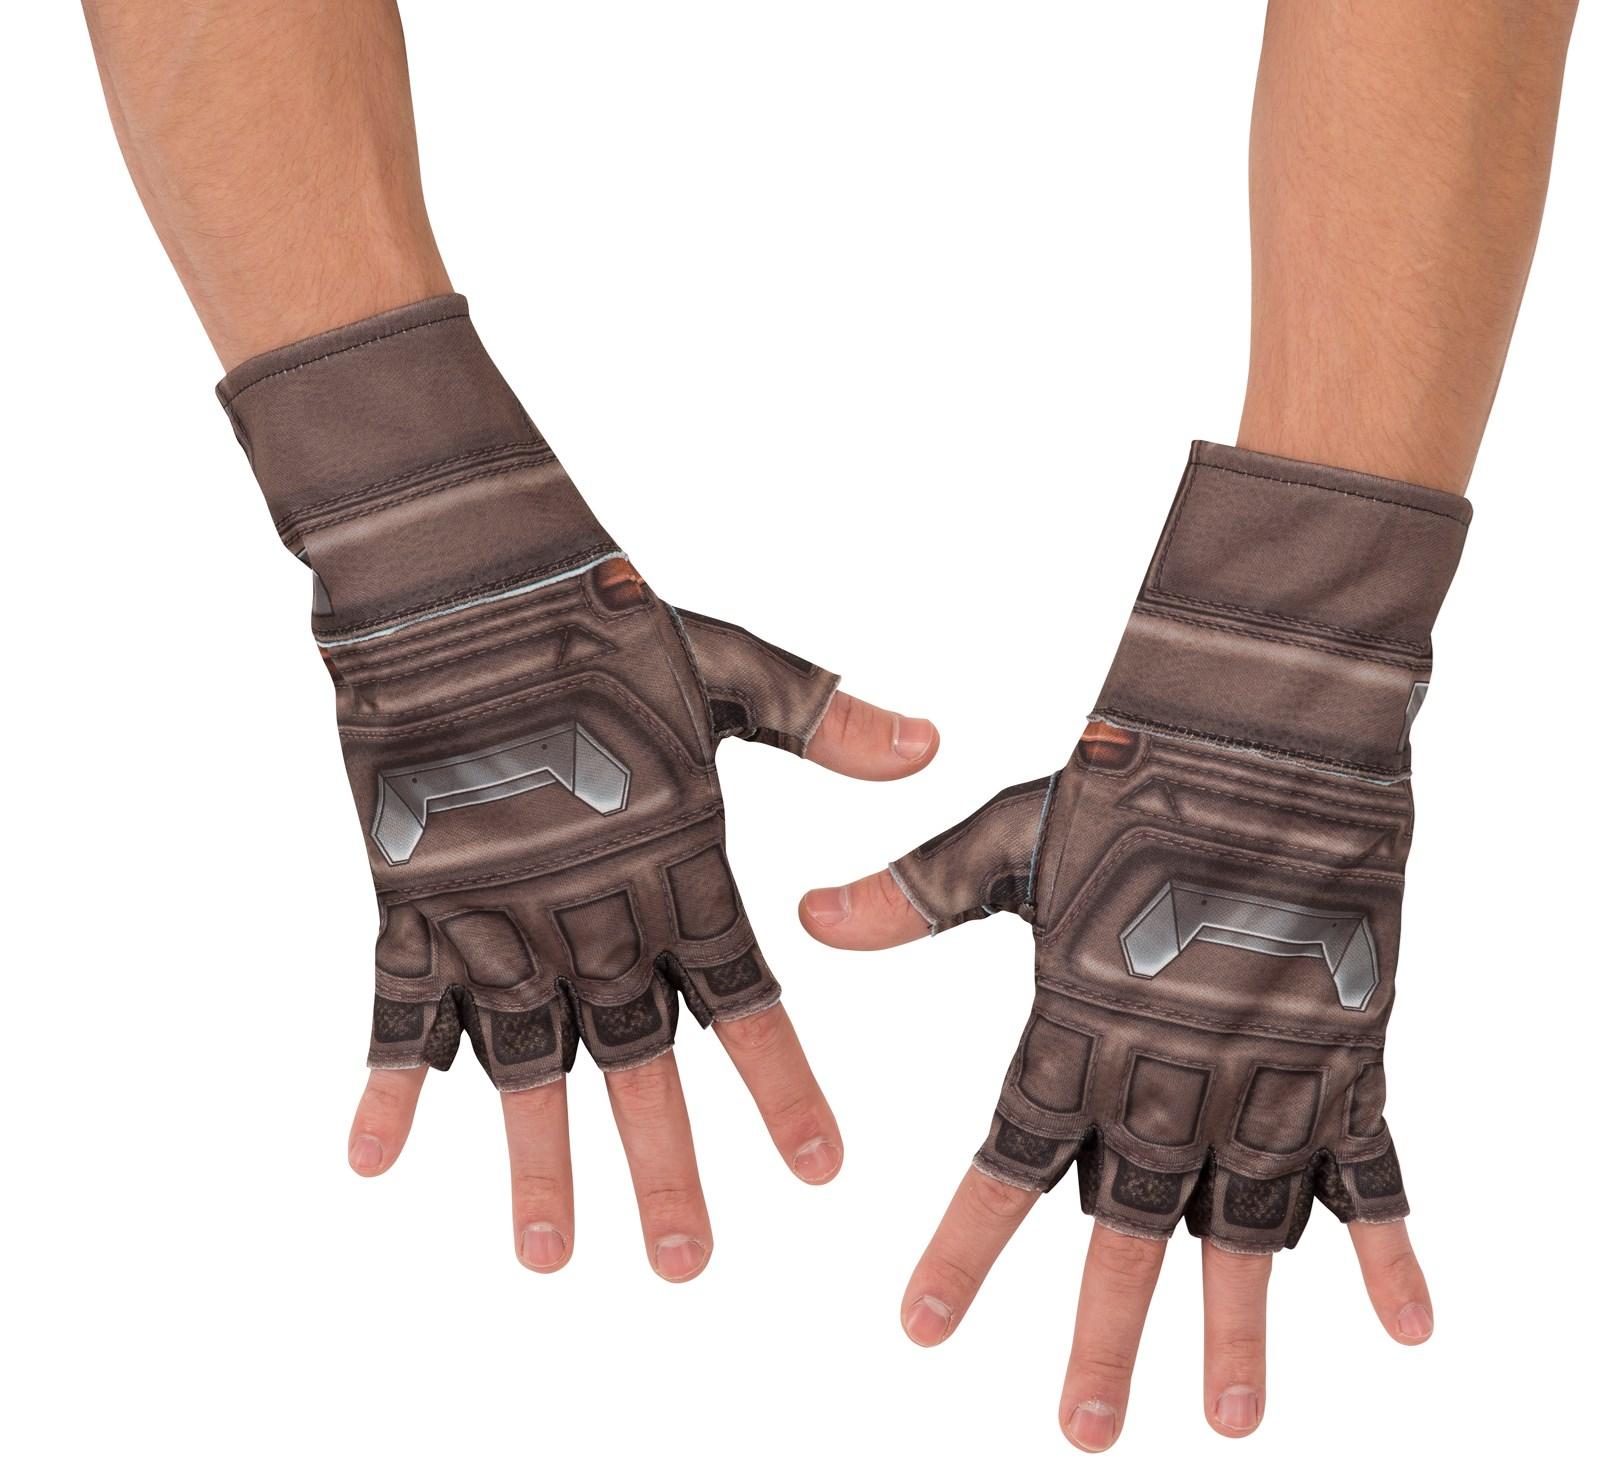 Mens leather kid gloves - Avengers 2 Age Of Ultron Captain America Kids Gloves